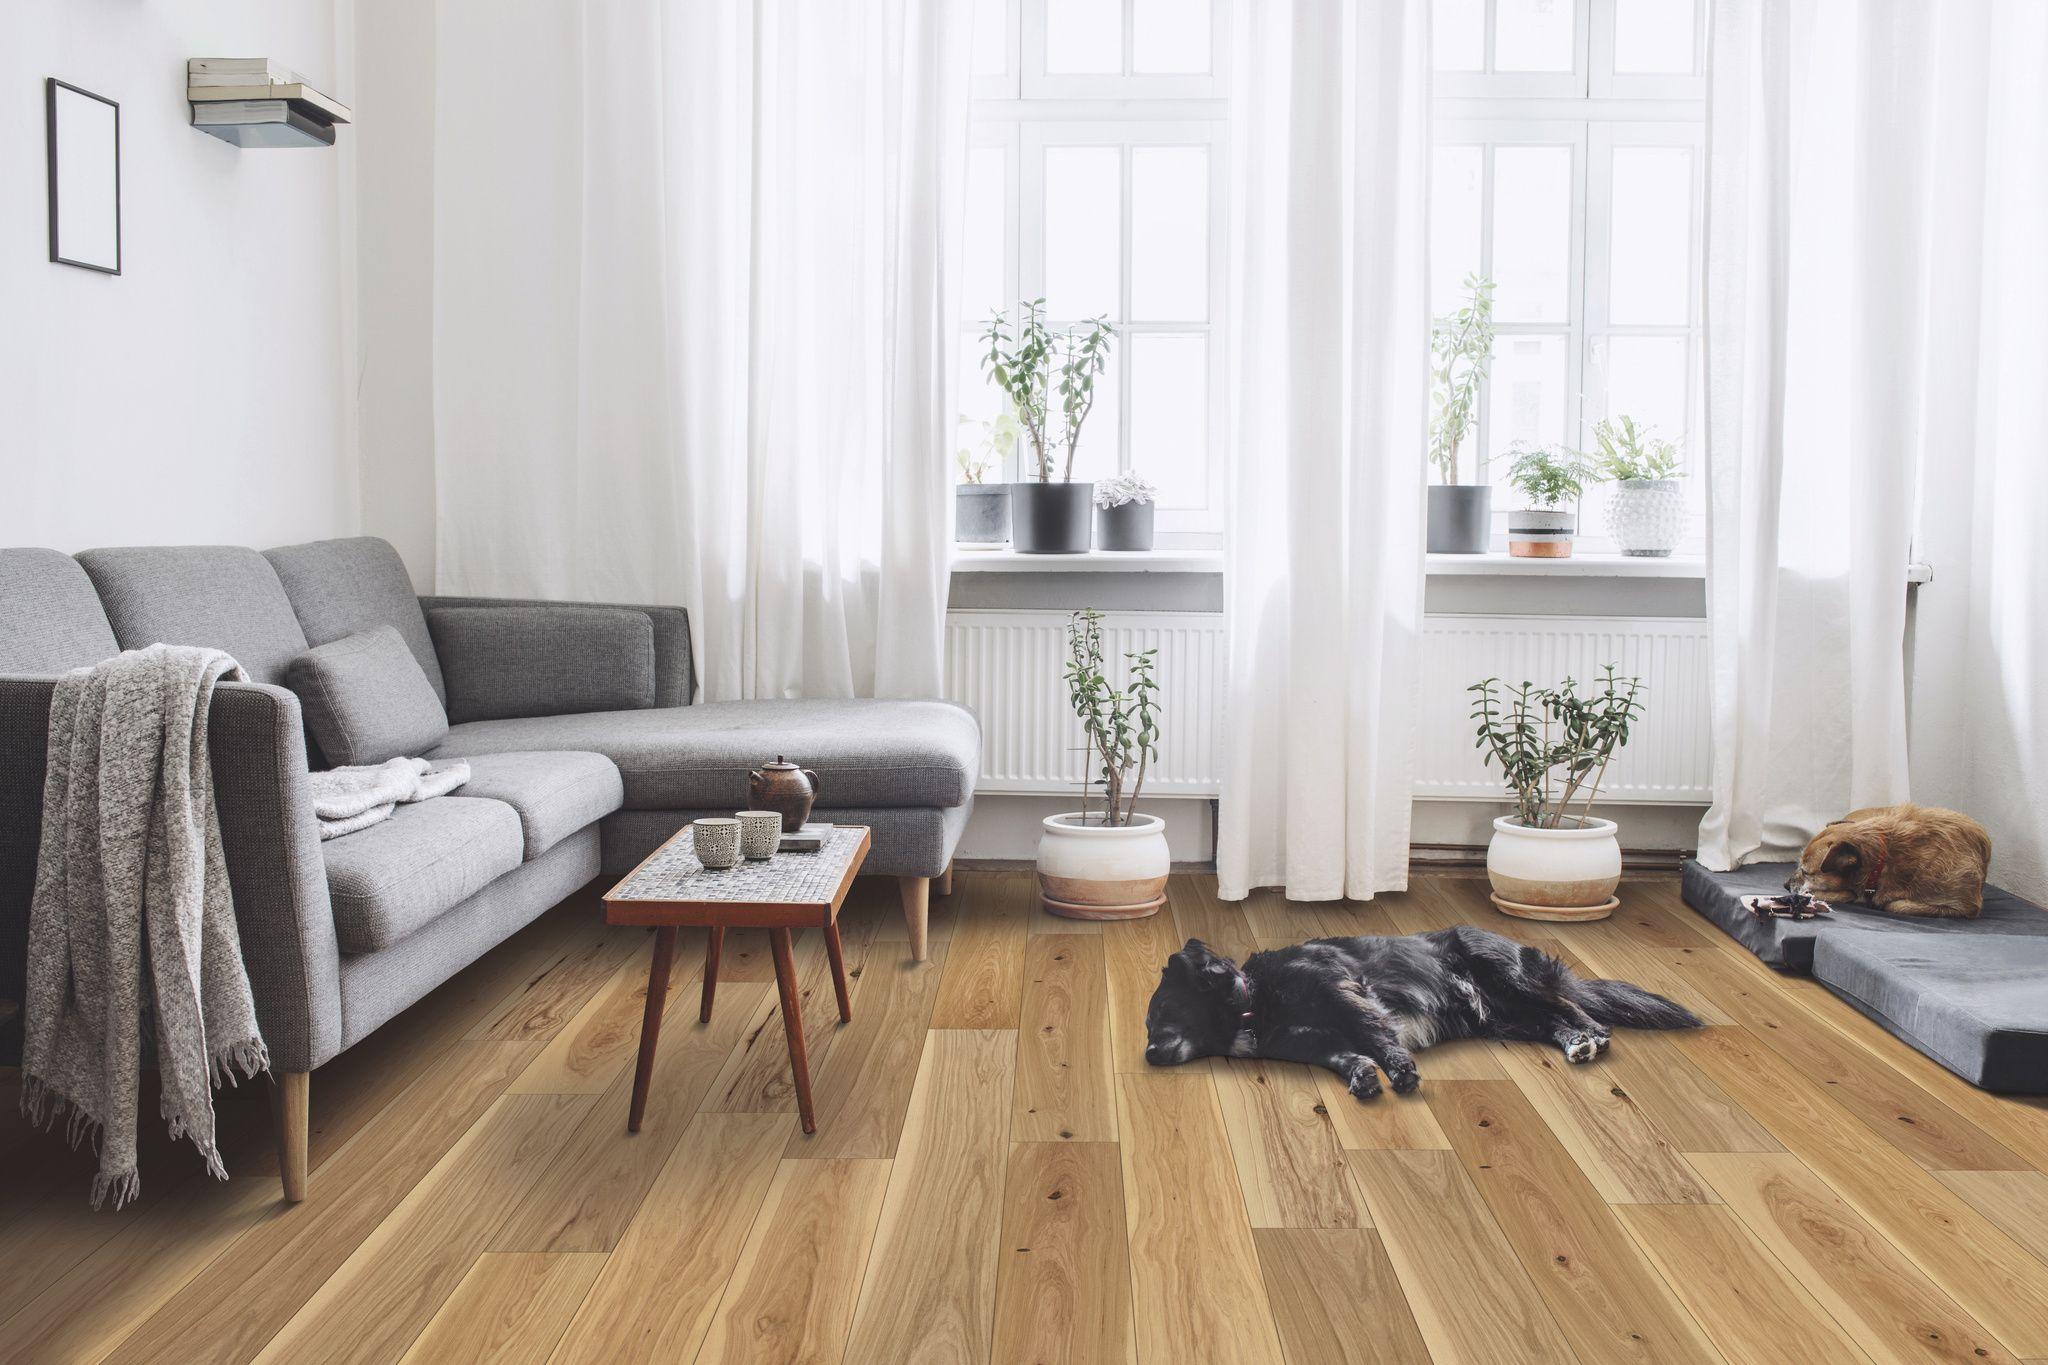 Durable and Stylish Floors Coretec Wood in 2020 Vinyl